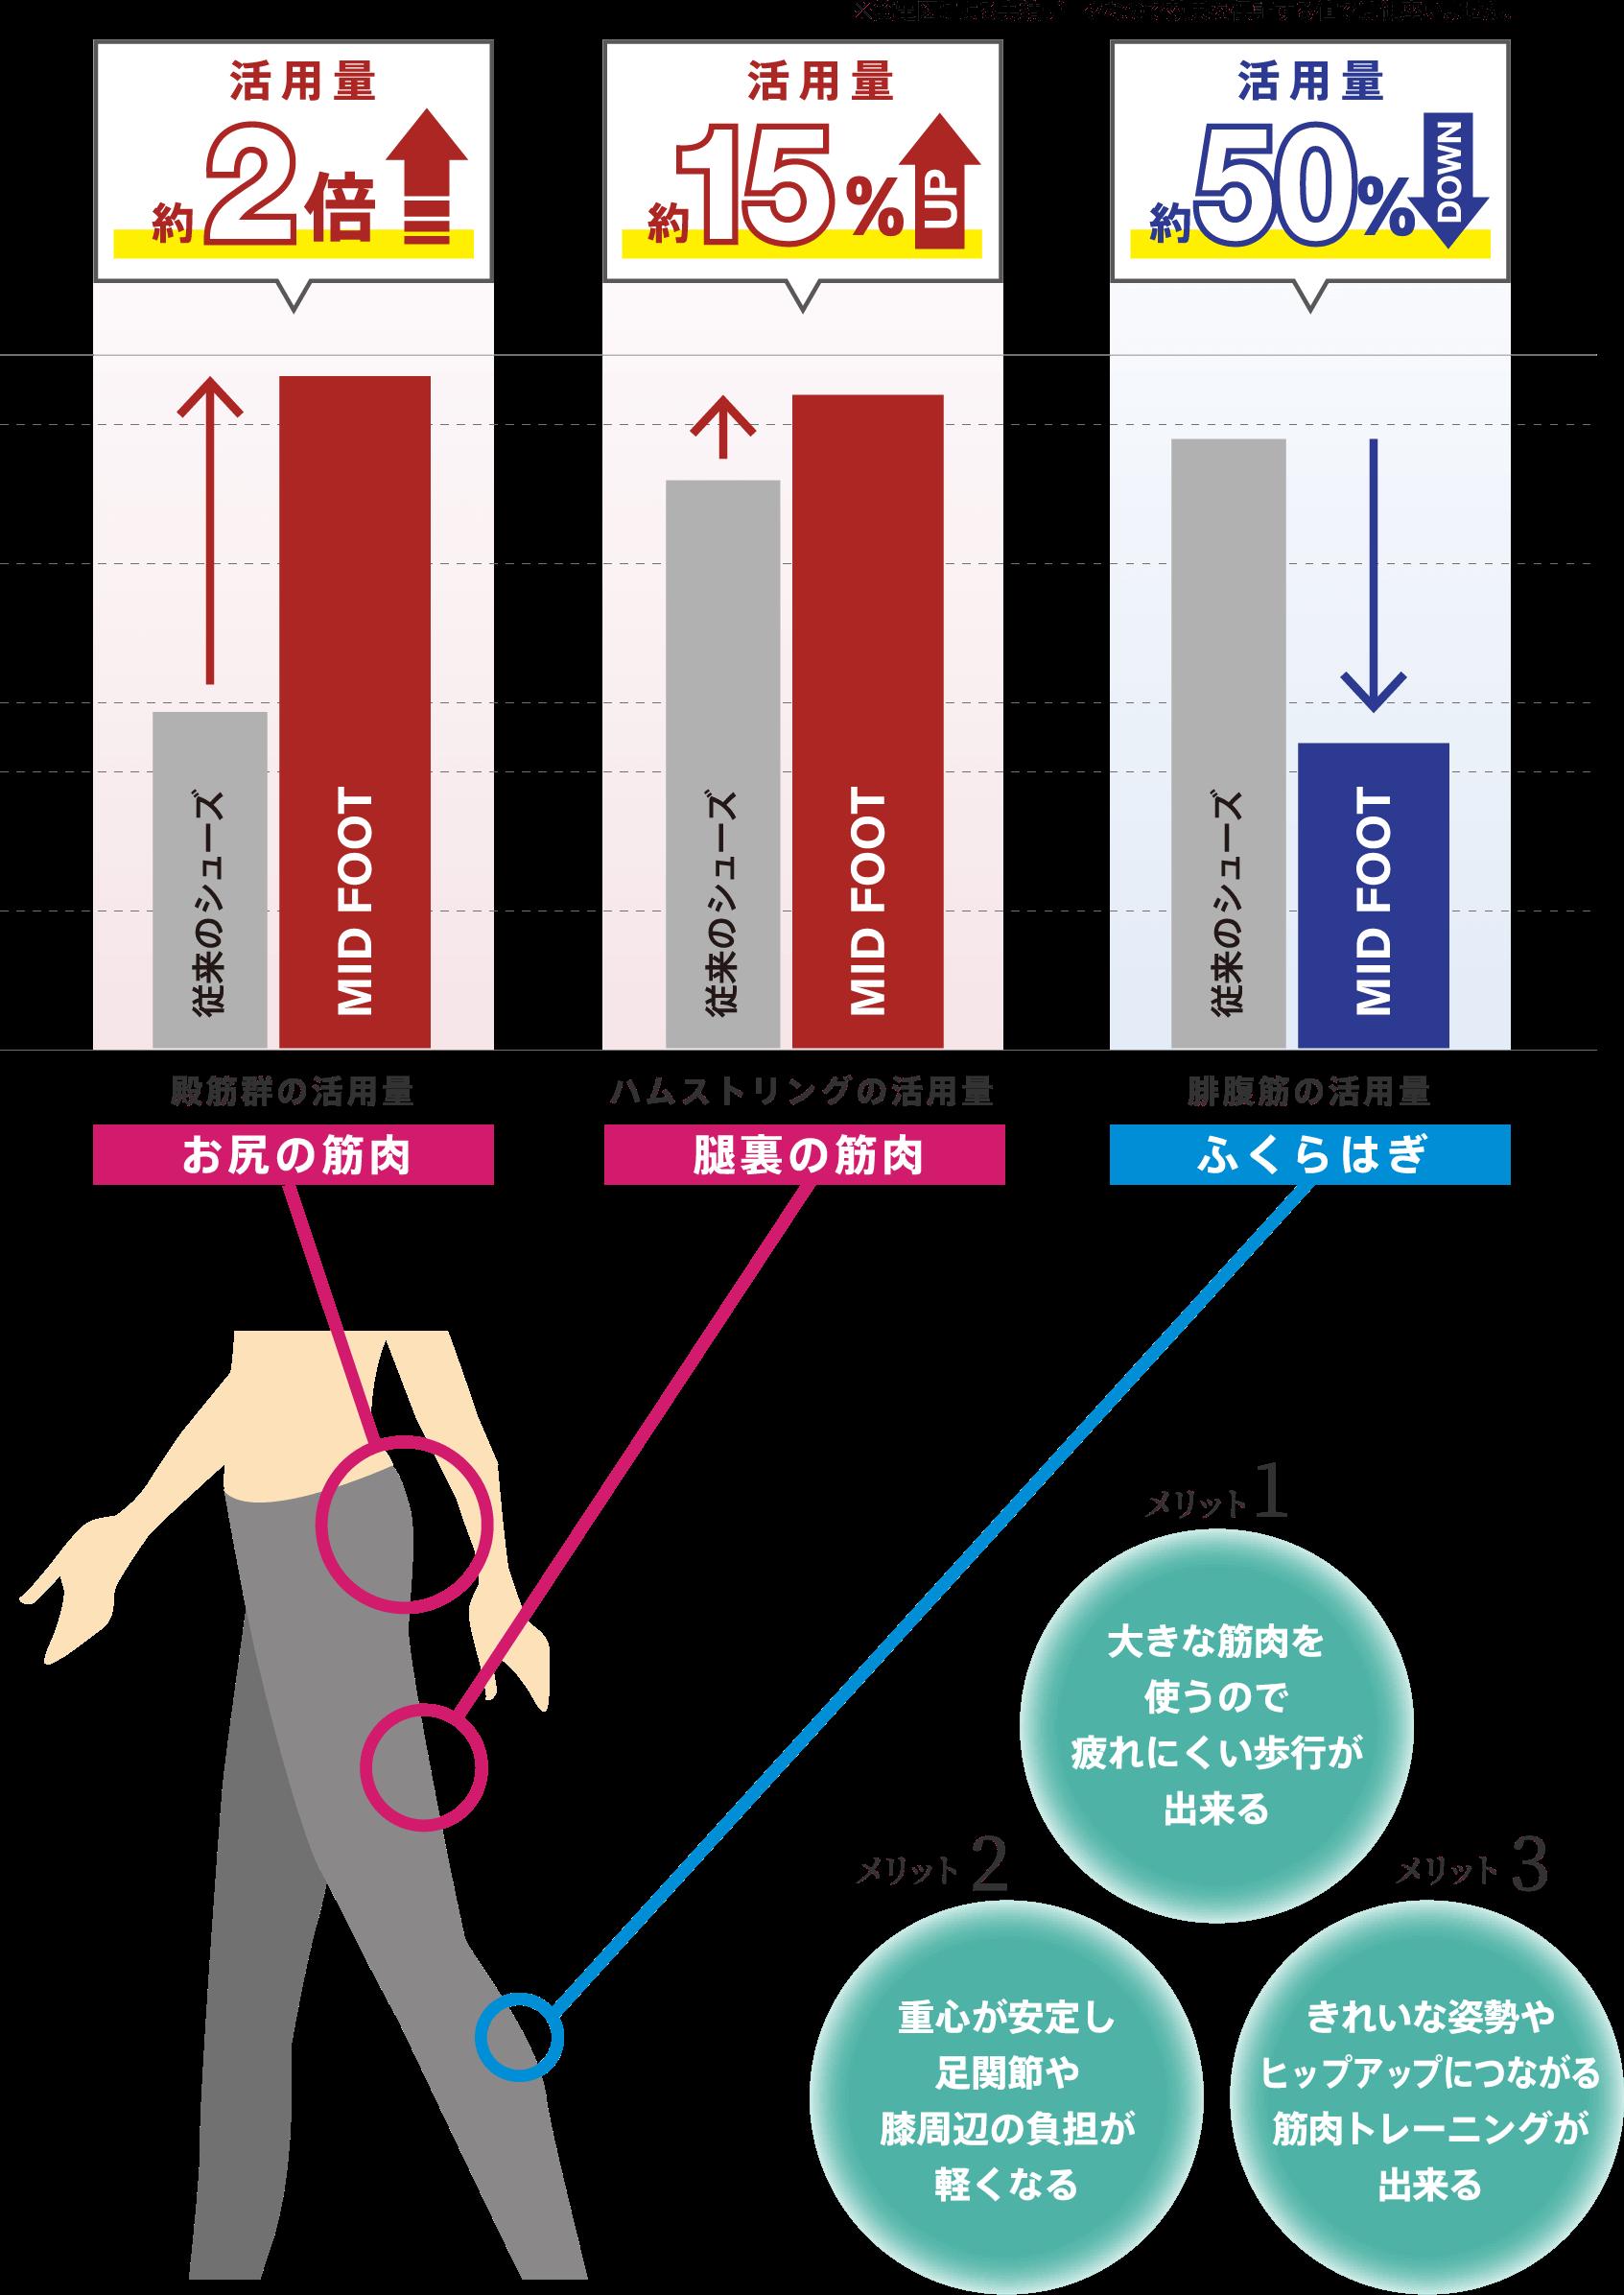 MIDFOOTはお尻の筋肉を積極的に活用します。